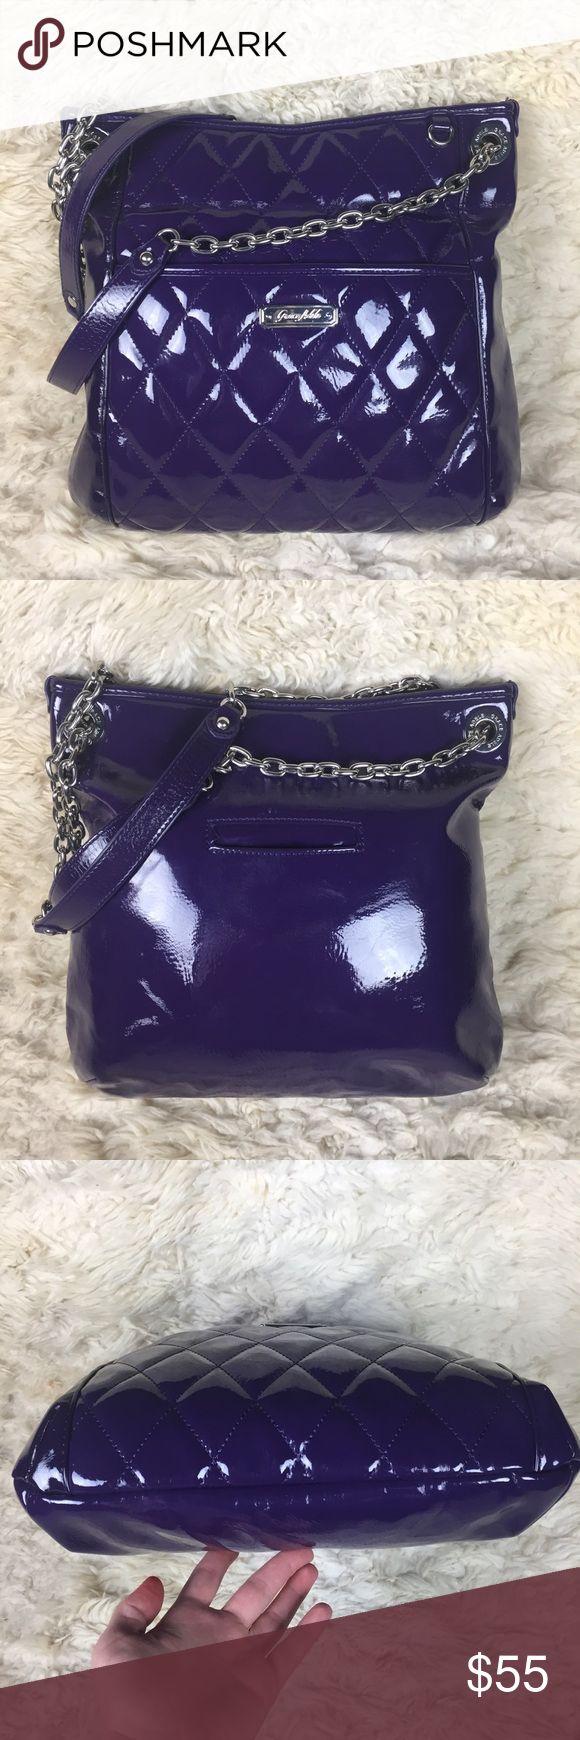 "Grace Adele Shoulder Bag Dark purple/plum color GRACE ADELE shoulder bag.  100% polyurethane. Lot of pockets inside, one on front/back too, silver chain on strap.  Length-13.5"" width-14"".  Excellent condition!! Grace Adele Bags Shoulder Bags"